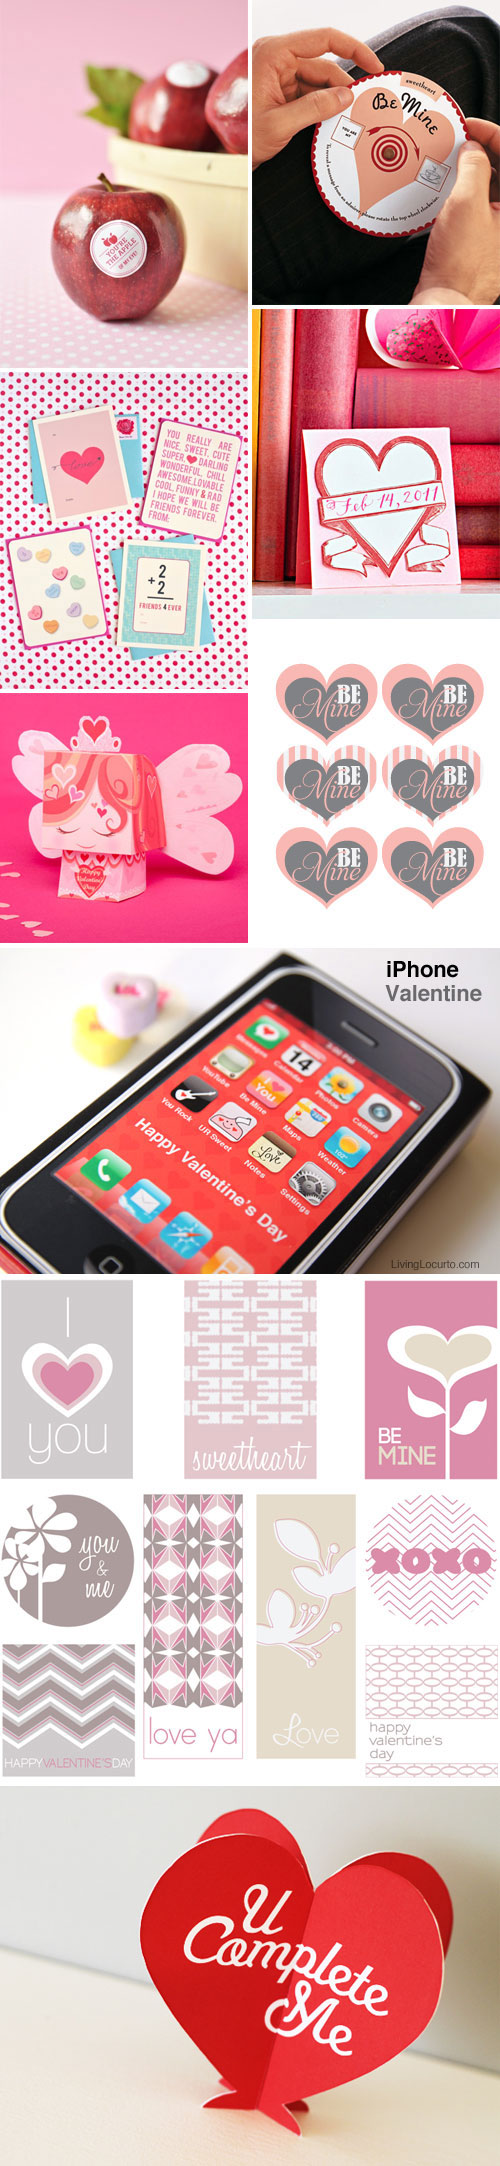 Free Printable Valentine's Day Goodies